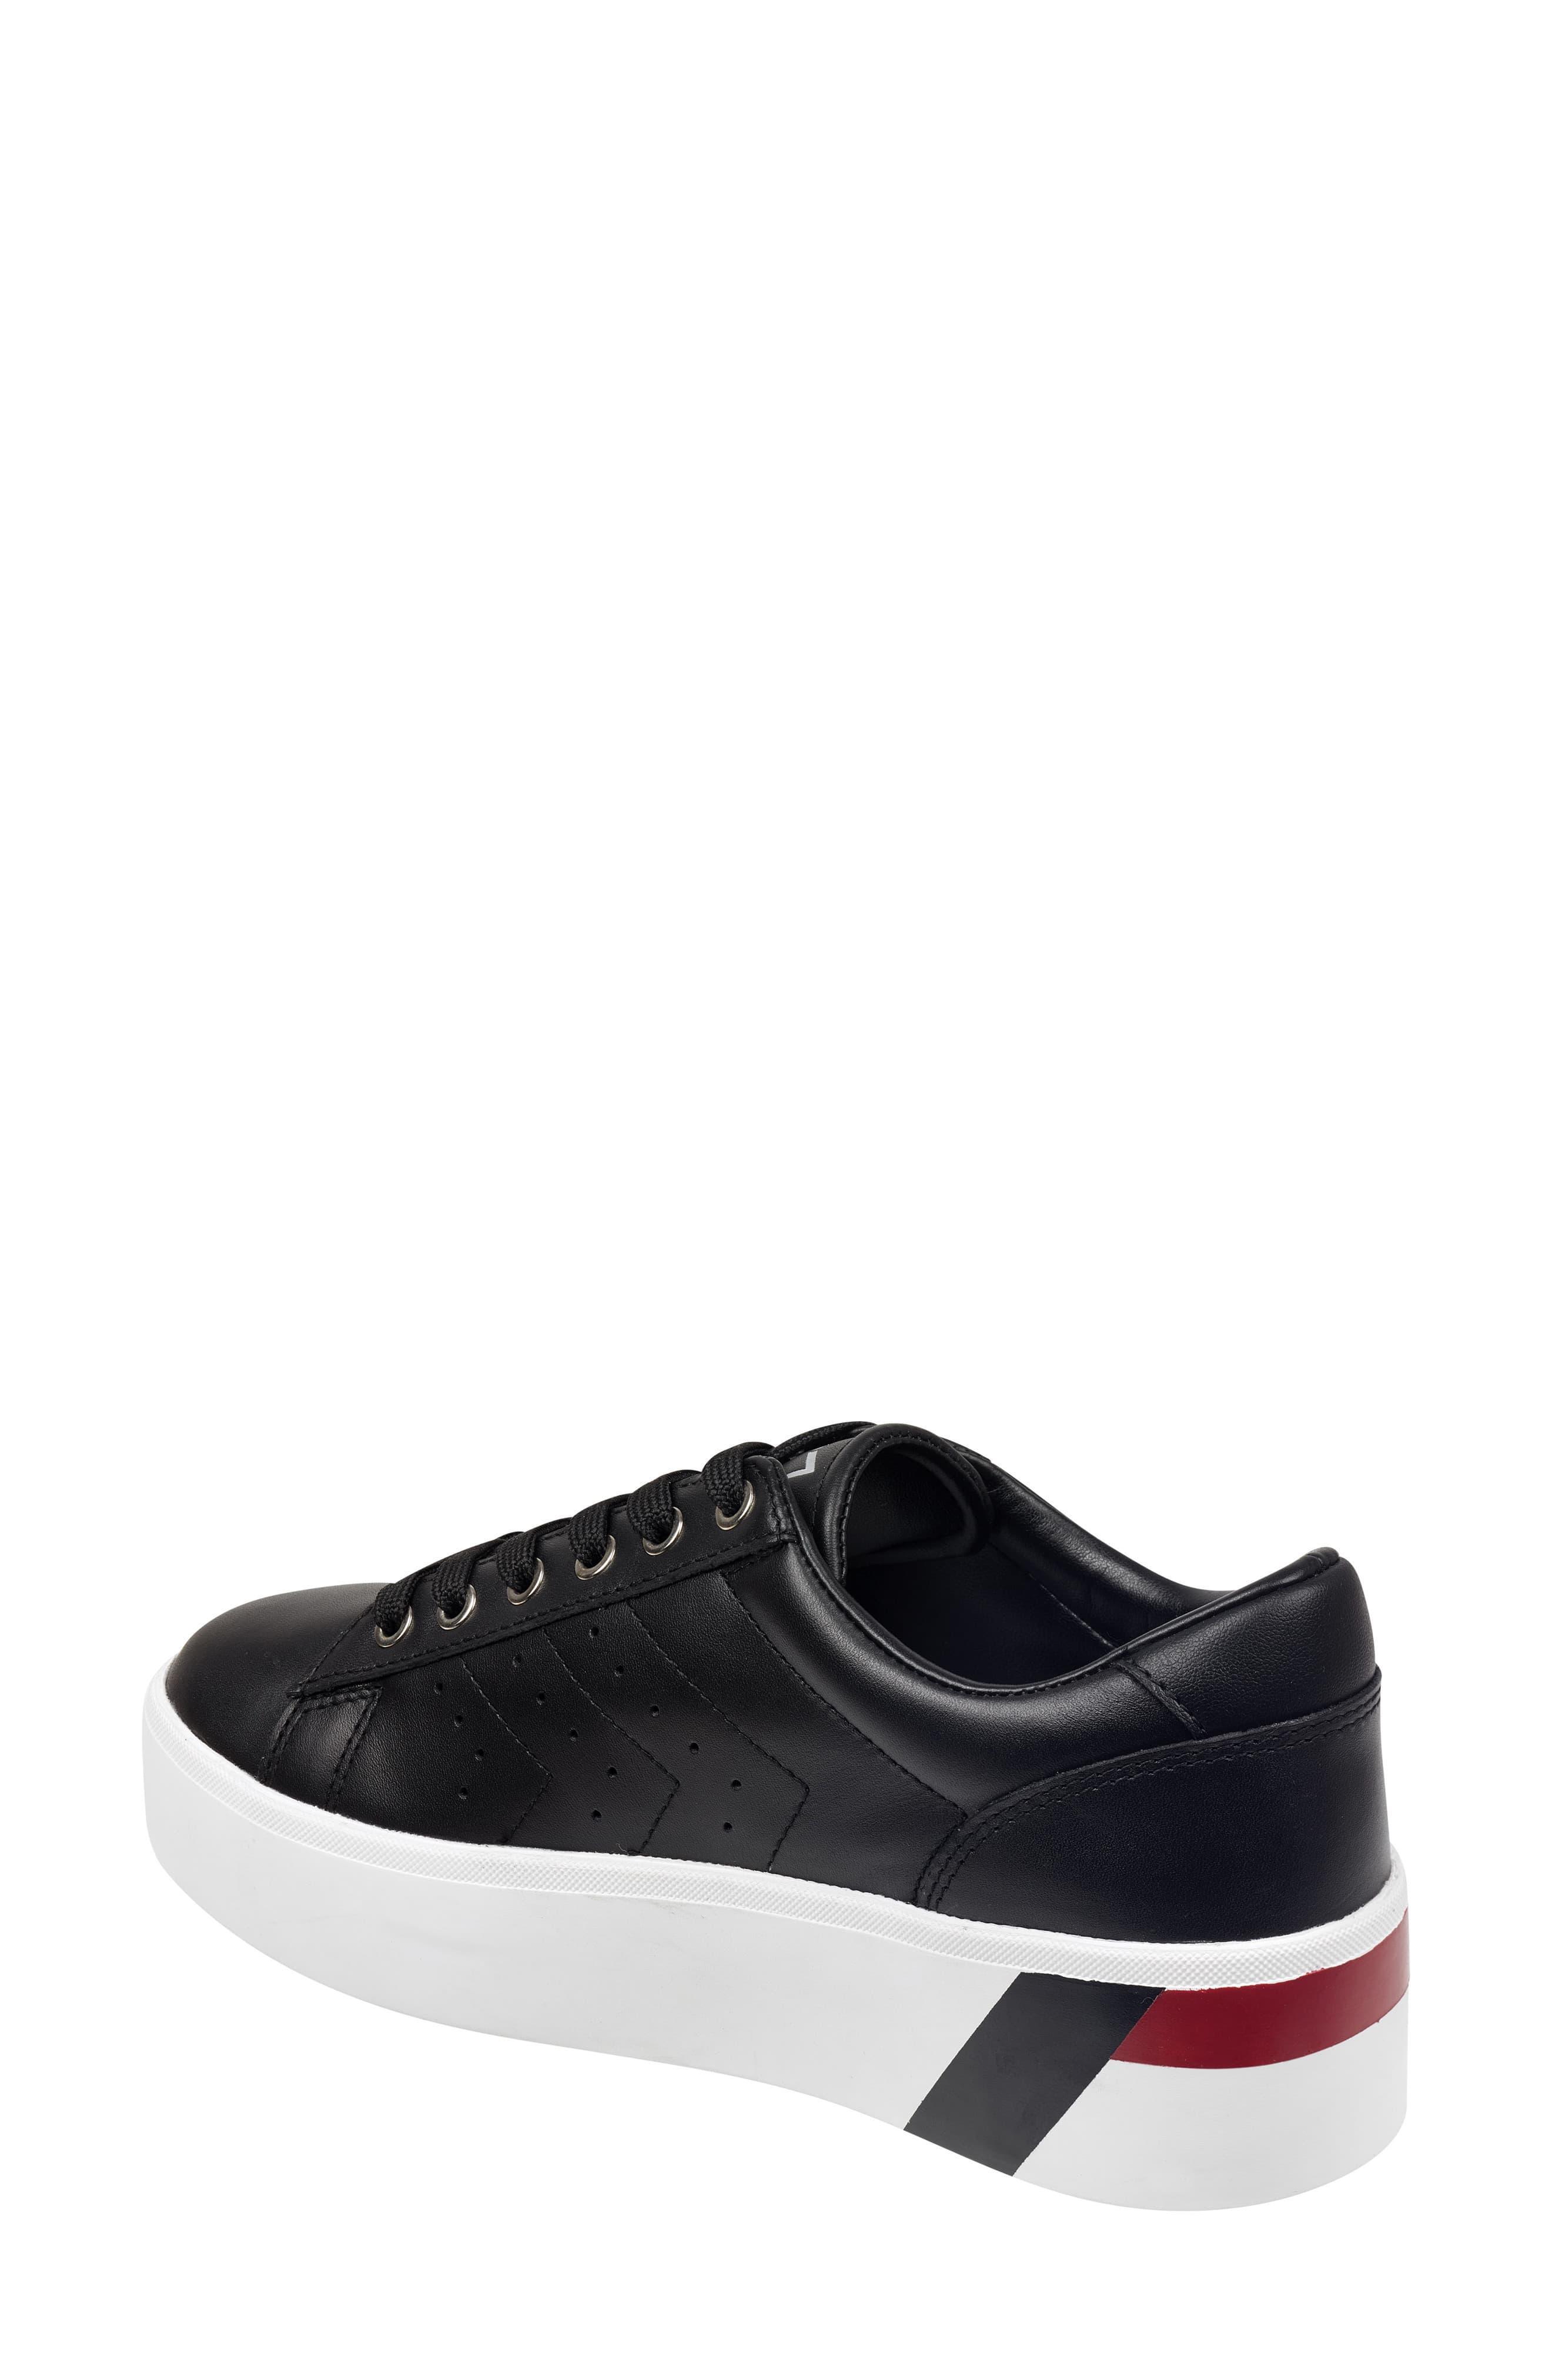 Marc Fisher Tony Sneaker in Black